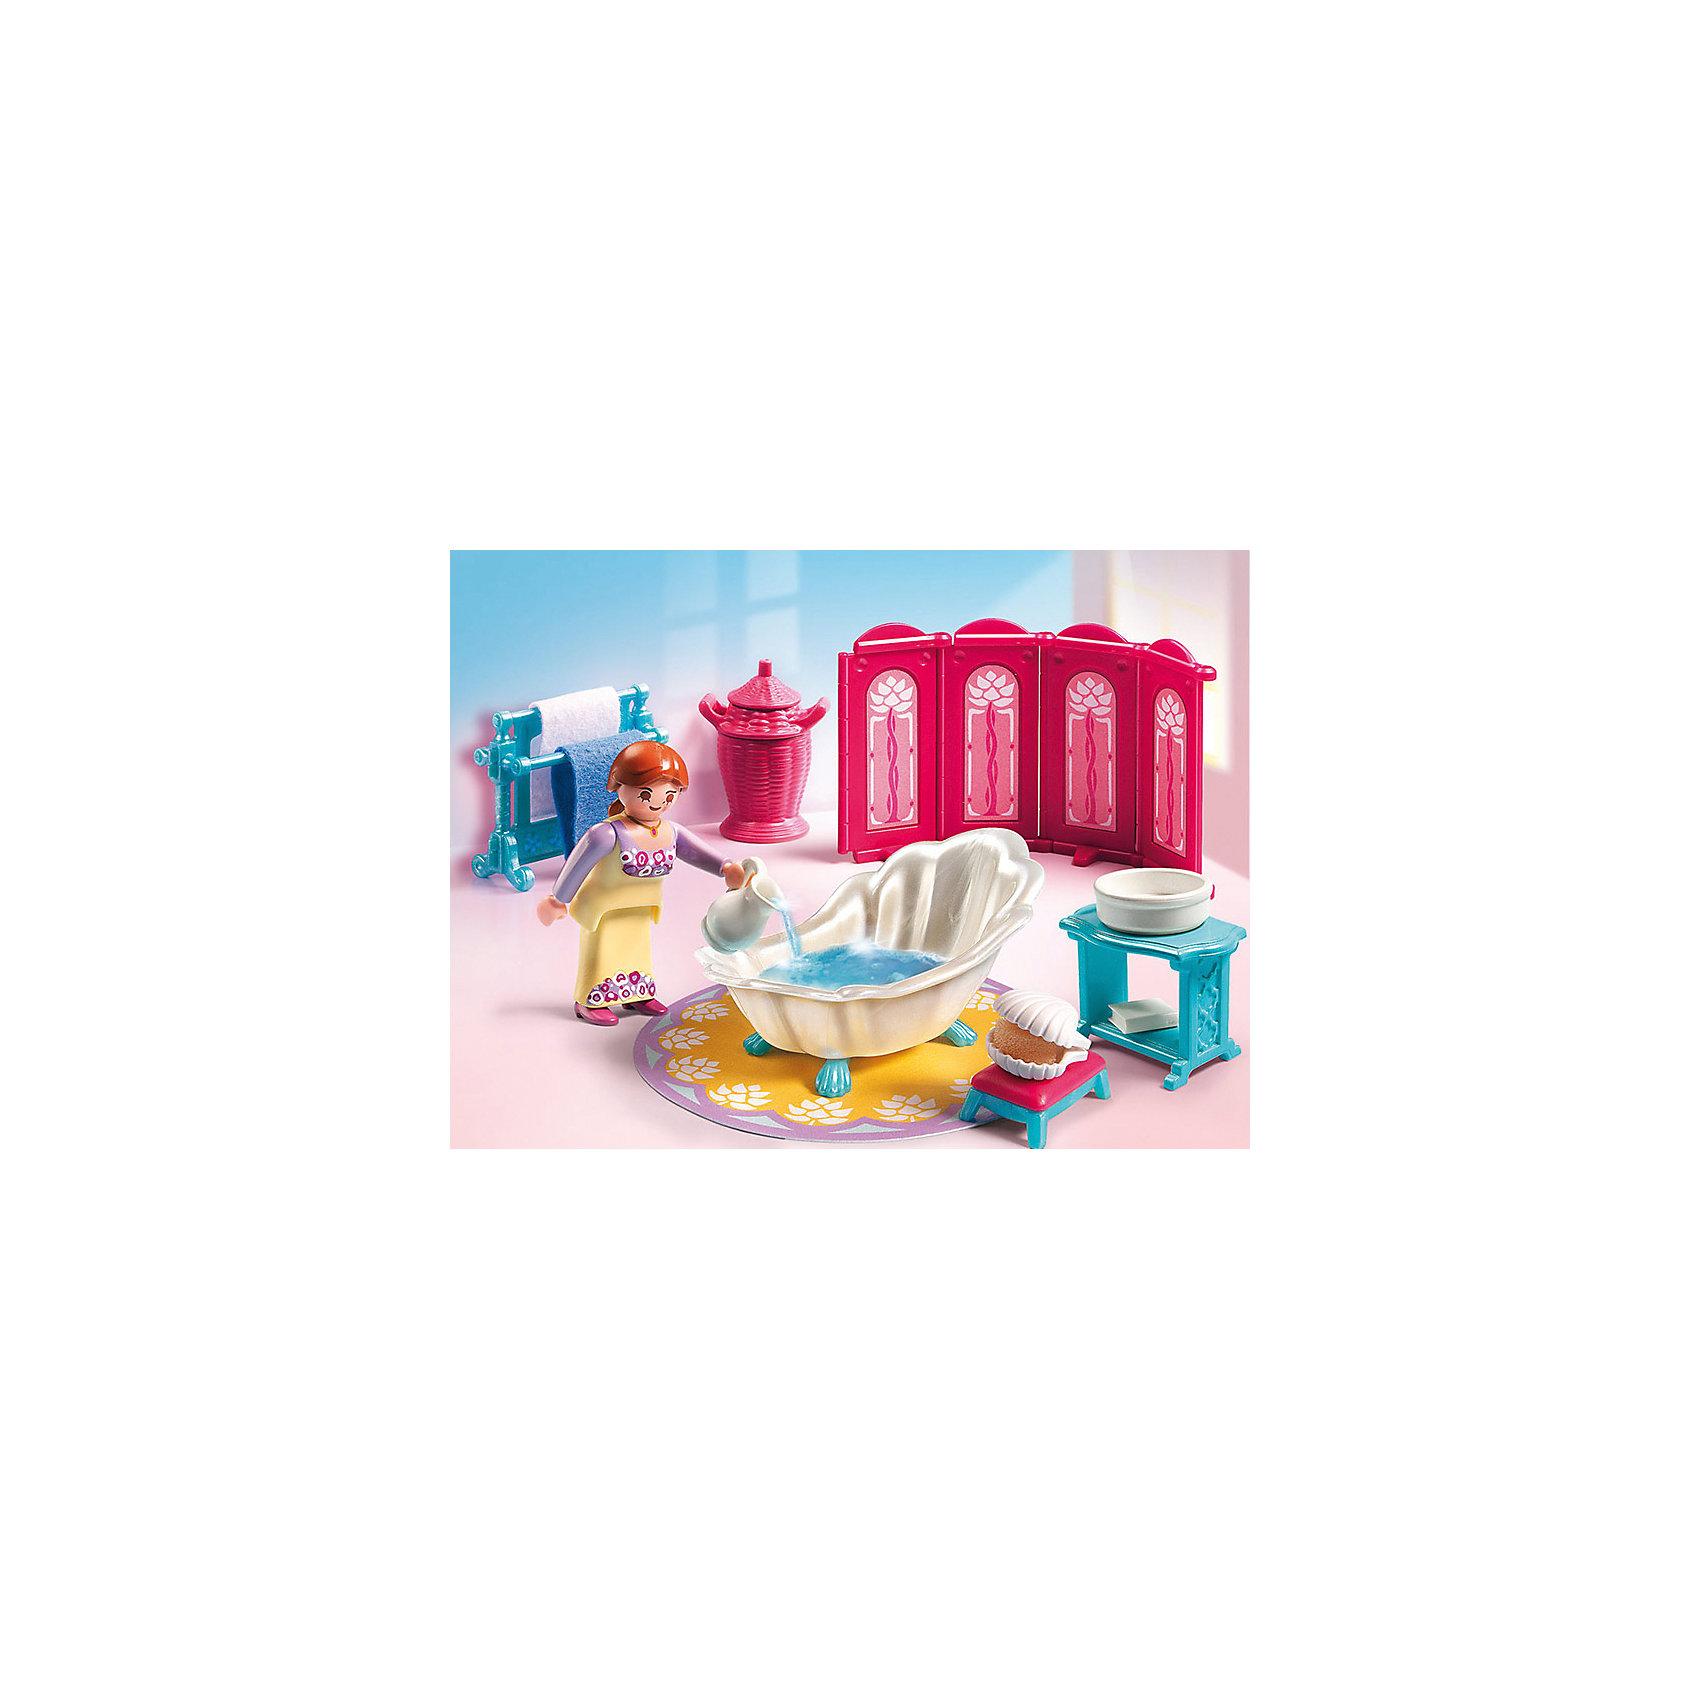 PLAYMOBIL® PLAYMOBIL 5147 Сказочный дворец: Королевская ванная комната playmobil® playmobil 5546 парк развлечений продавец шаров smileyworld